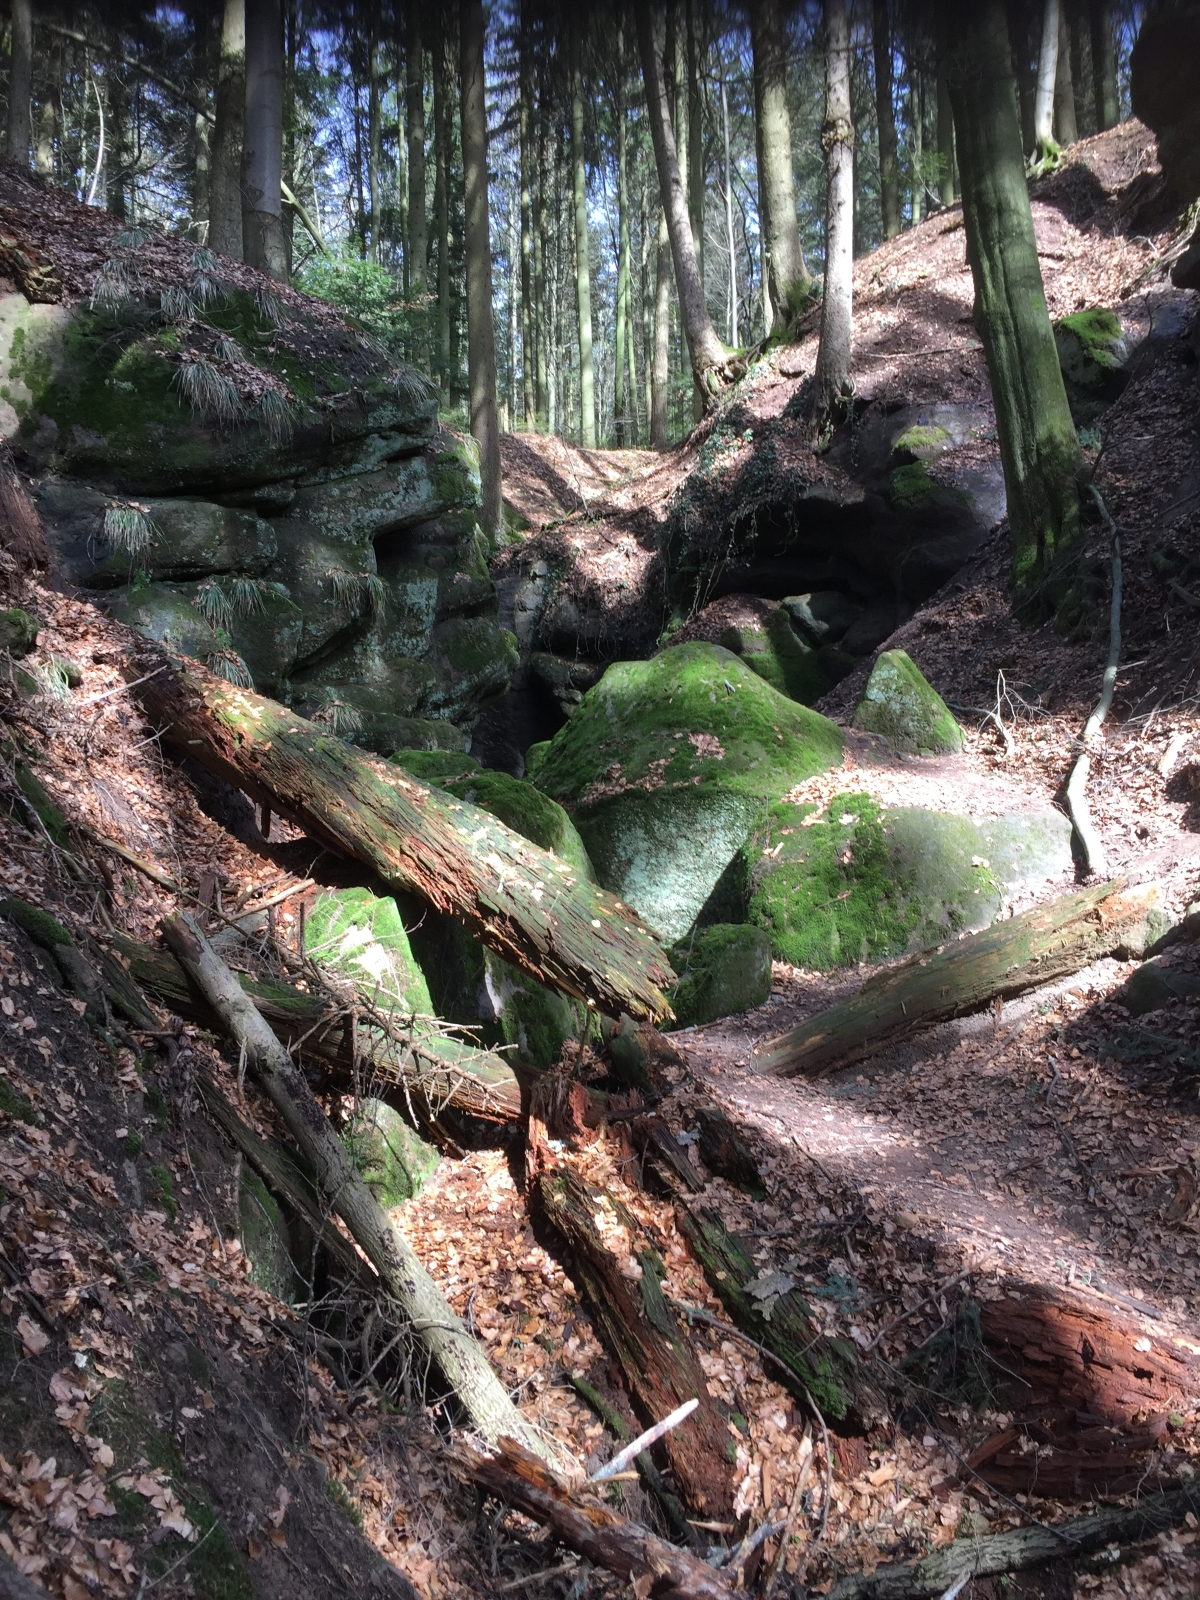 Gallenrotte am Ebnisee